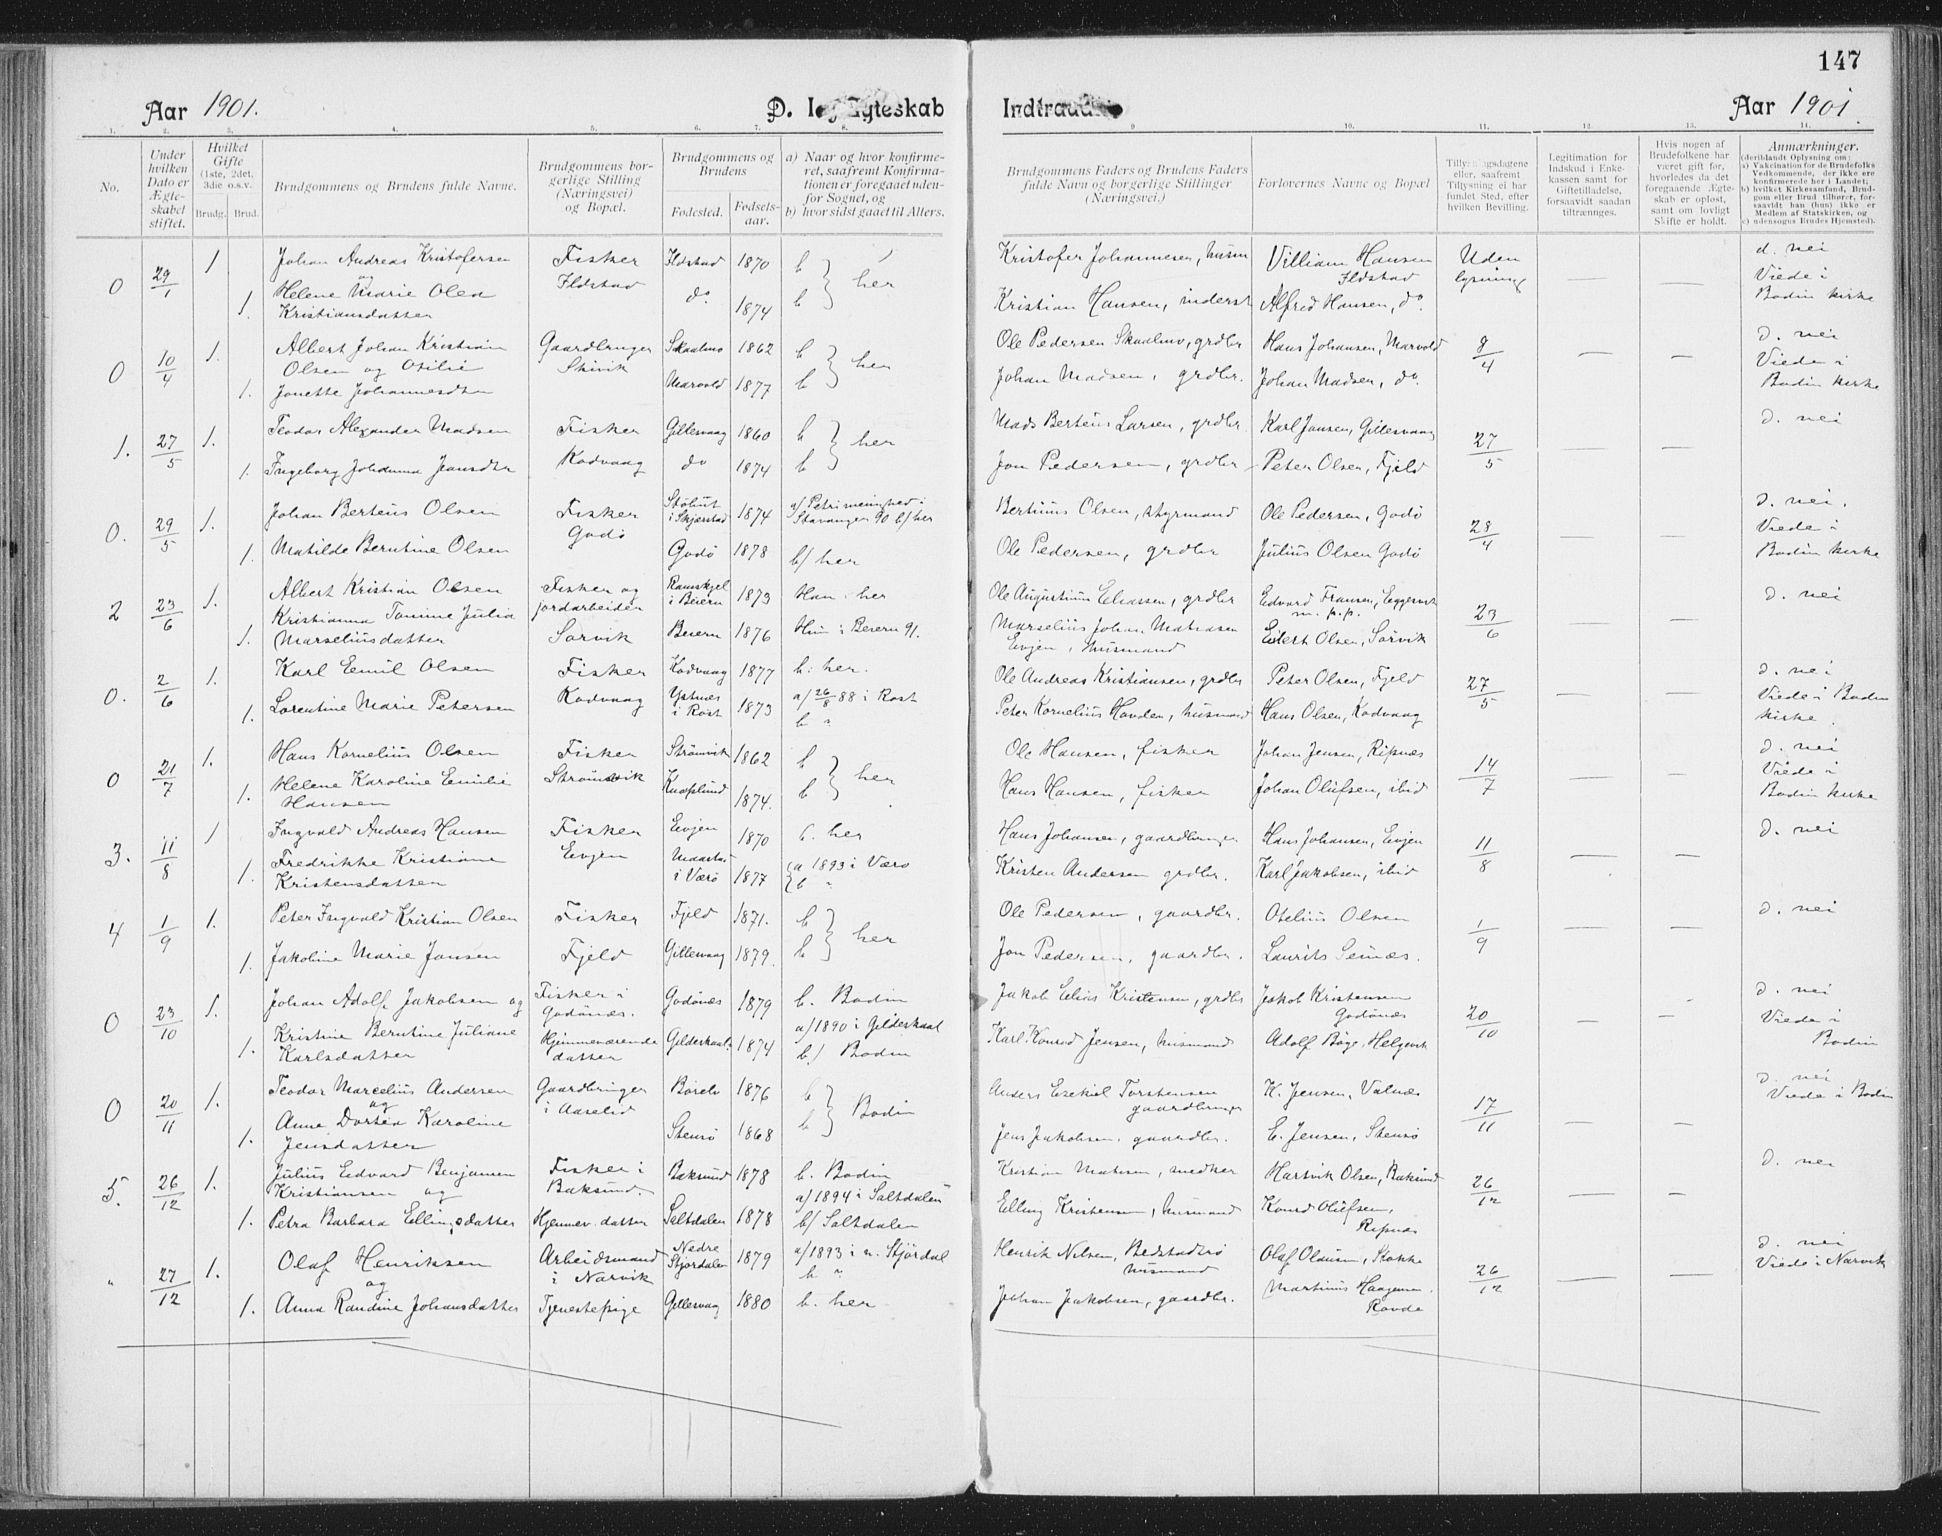 SAT, Ministerialprotokoller, klokkerbøker og fødselsregistre - Nordland, 804/L0081: Ministerialbok nr. 804A02, 1901-1915, s. 147